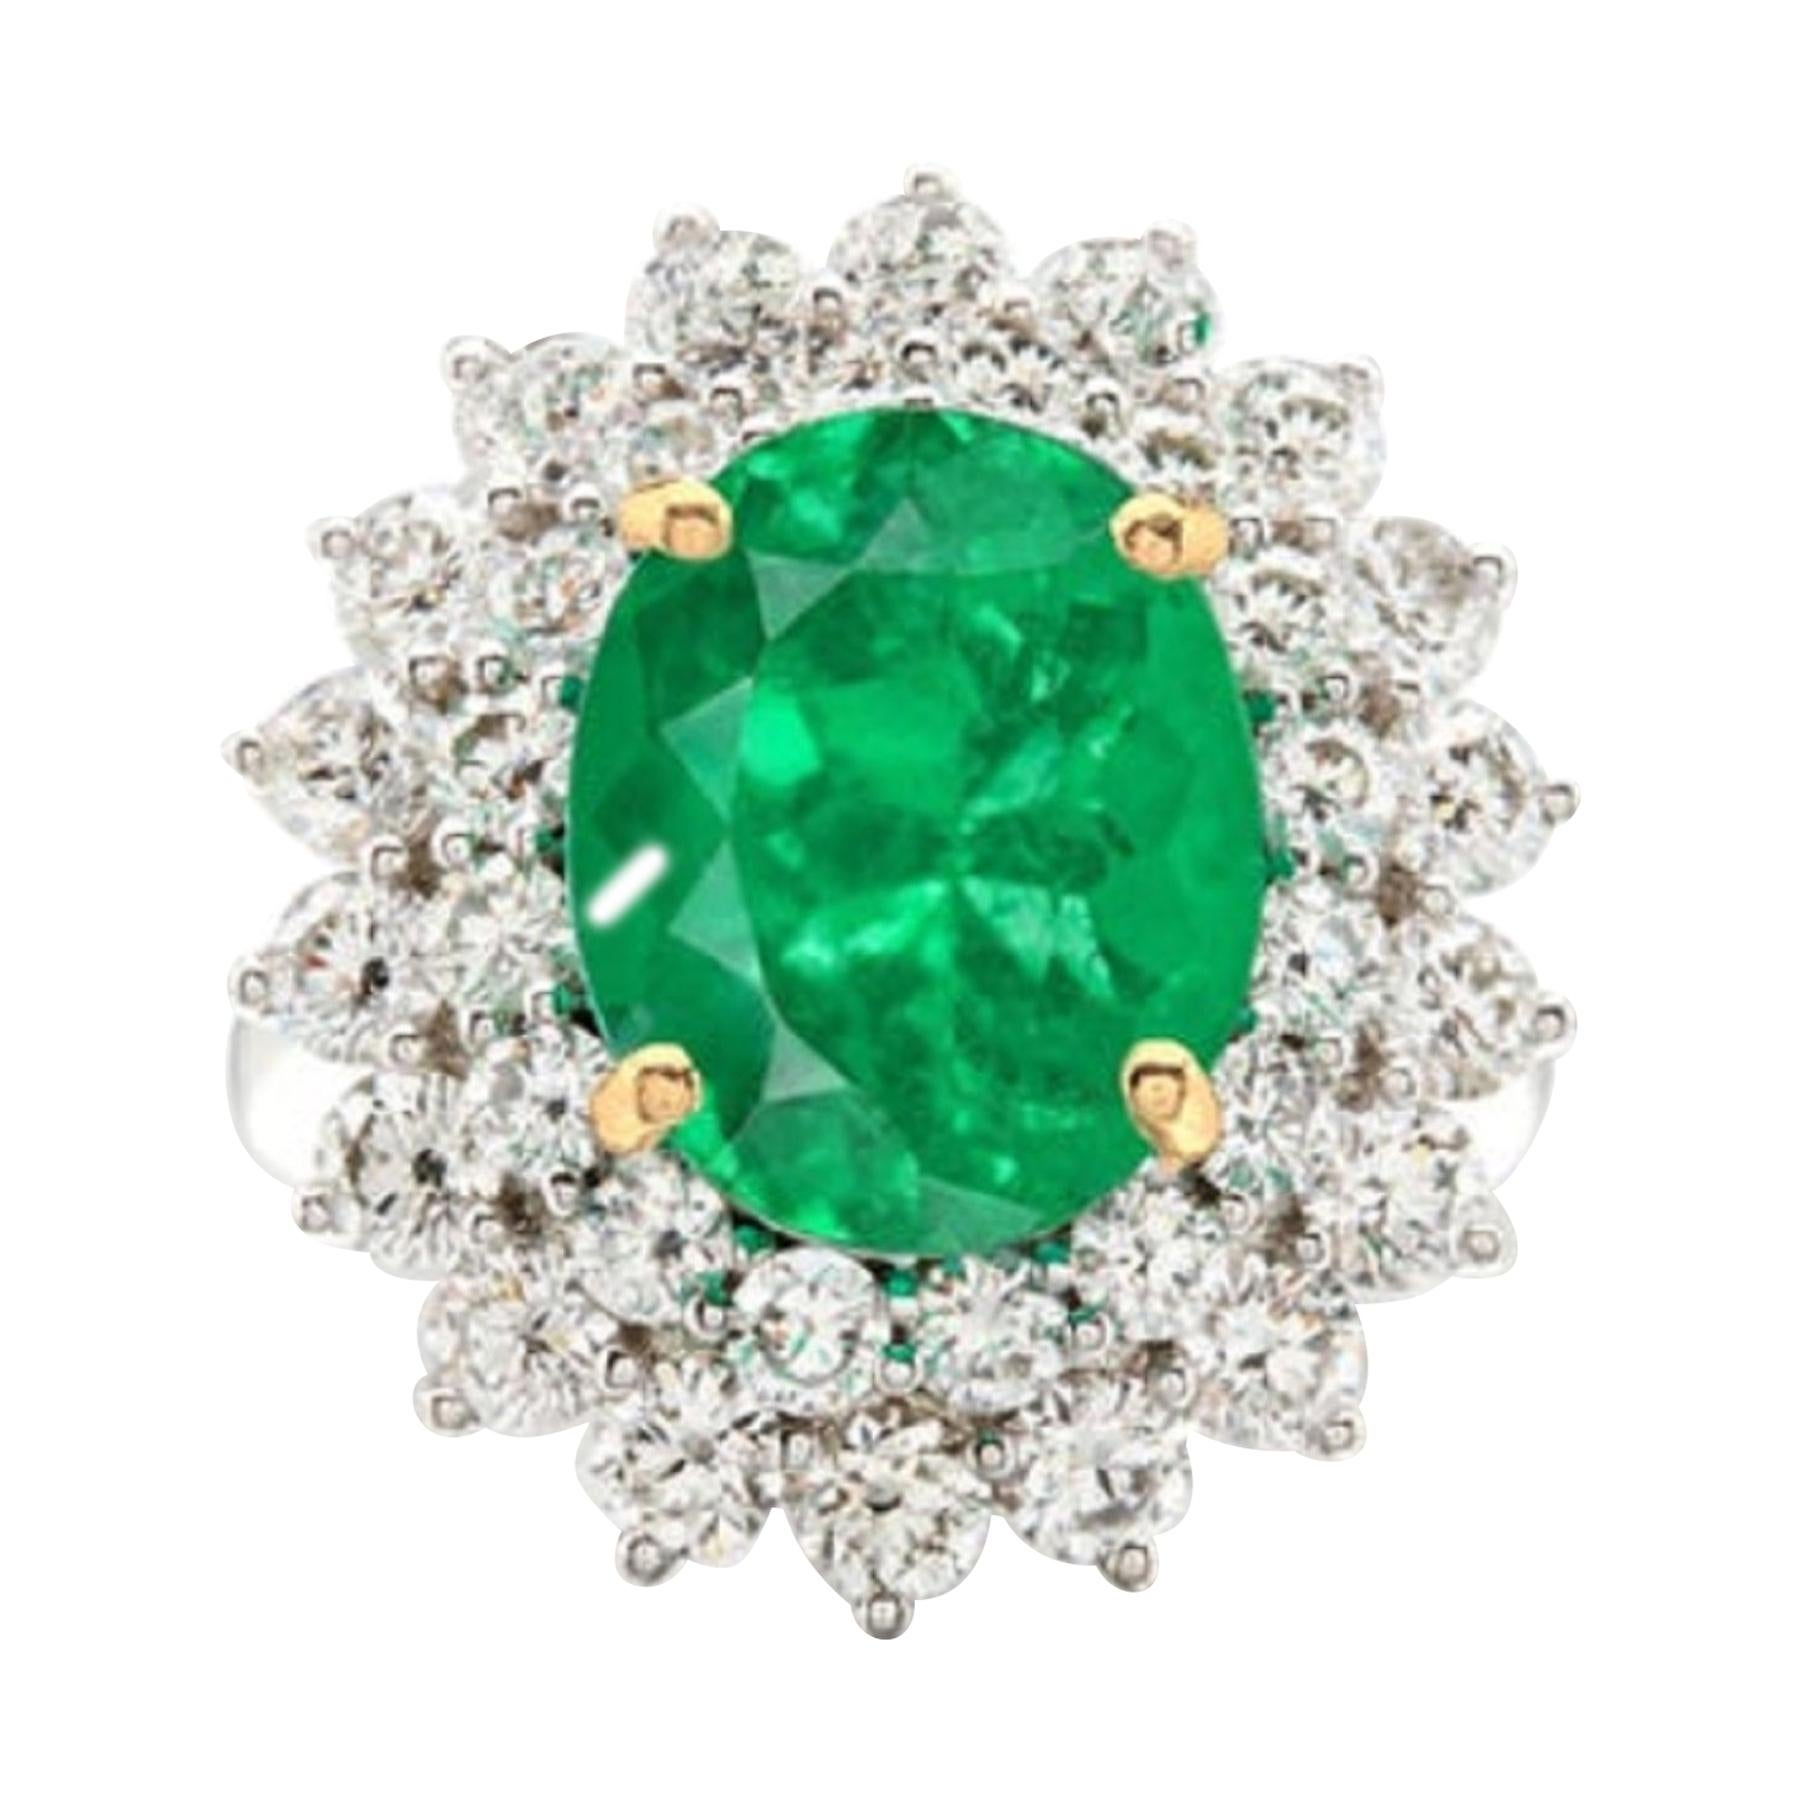 GRS Switzerland 5.80 Carat Colombian Emerald Diamond Cocktail Ring